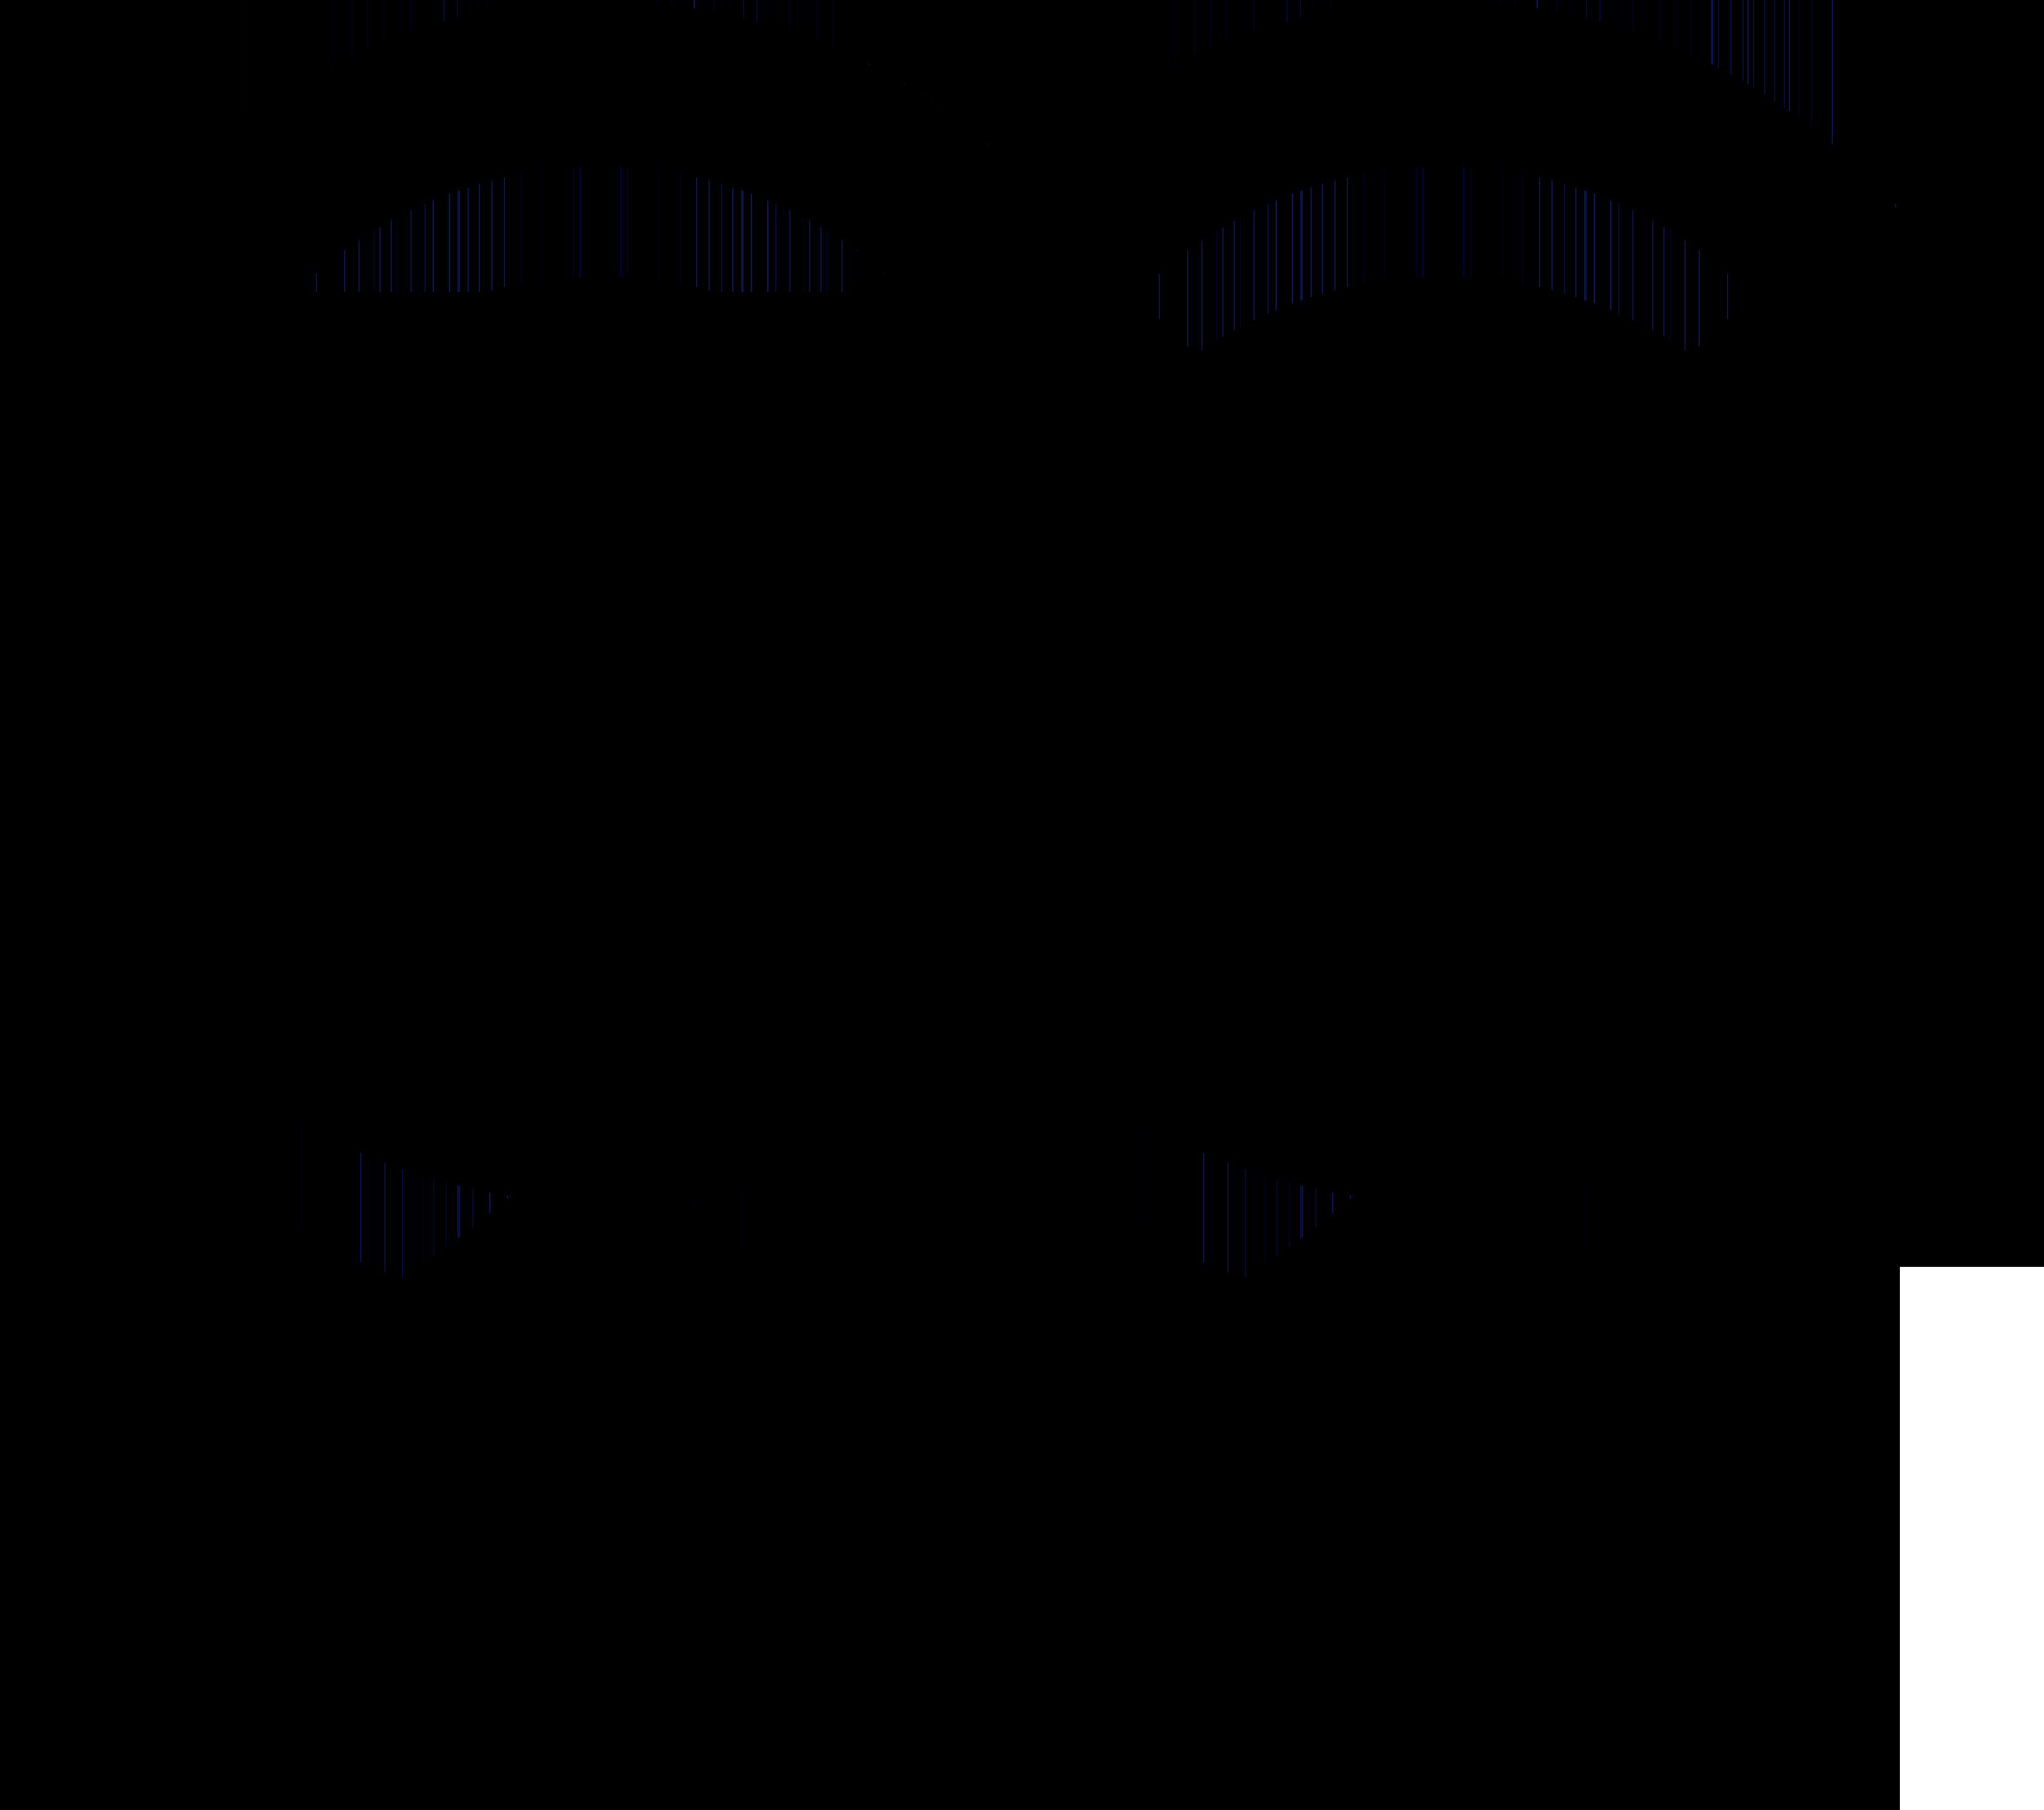 Nonbinary woman symbol interlocked with a Venus symbol.